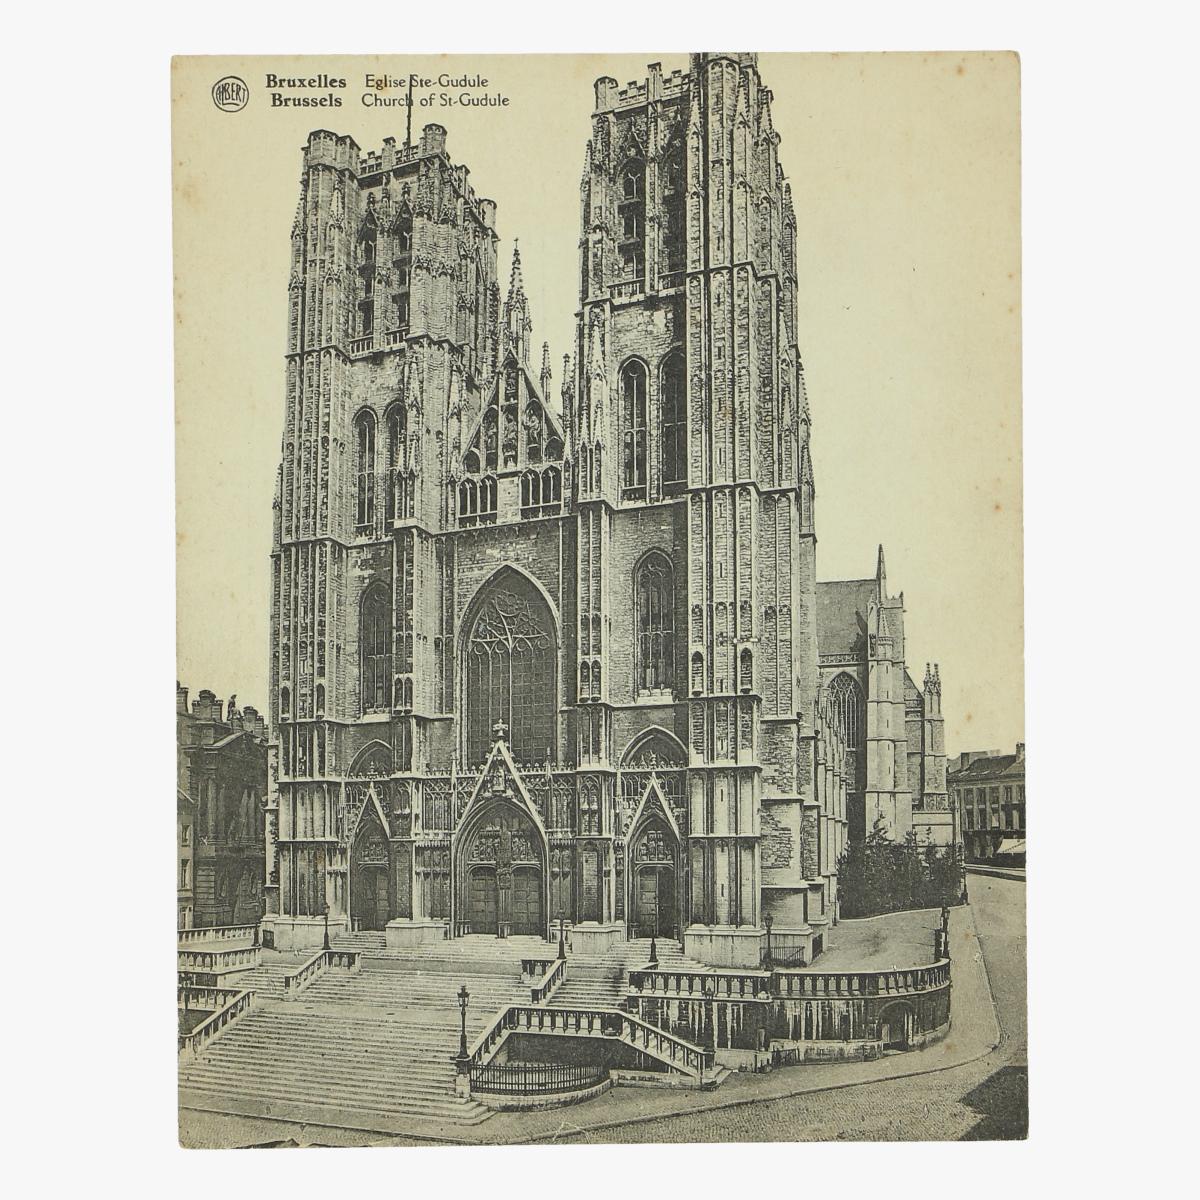 Afbeeldingen van oude postkaart brussels church of st-gudule